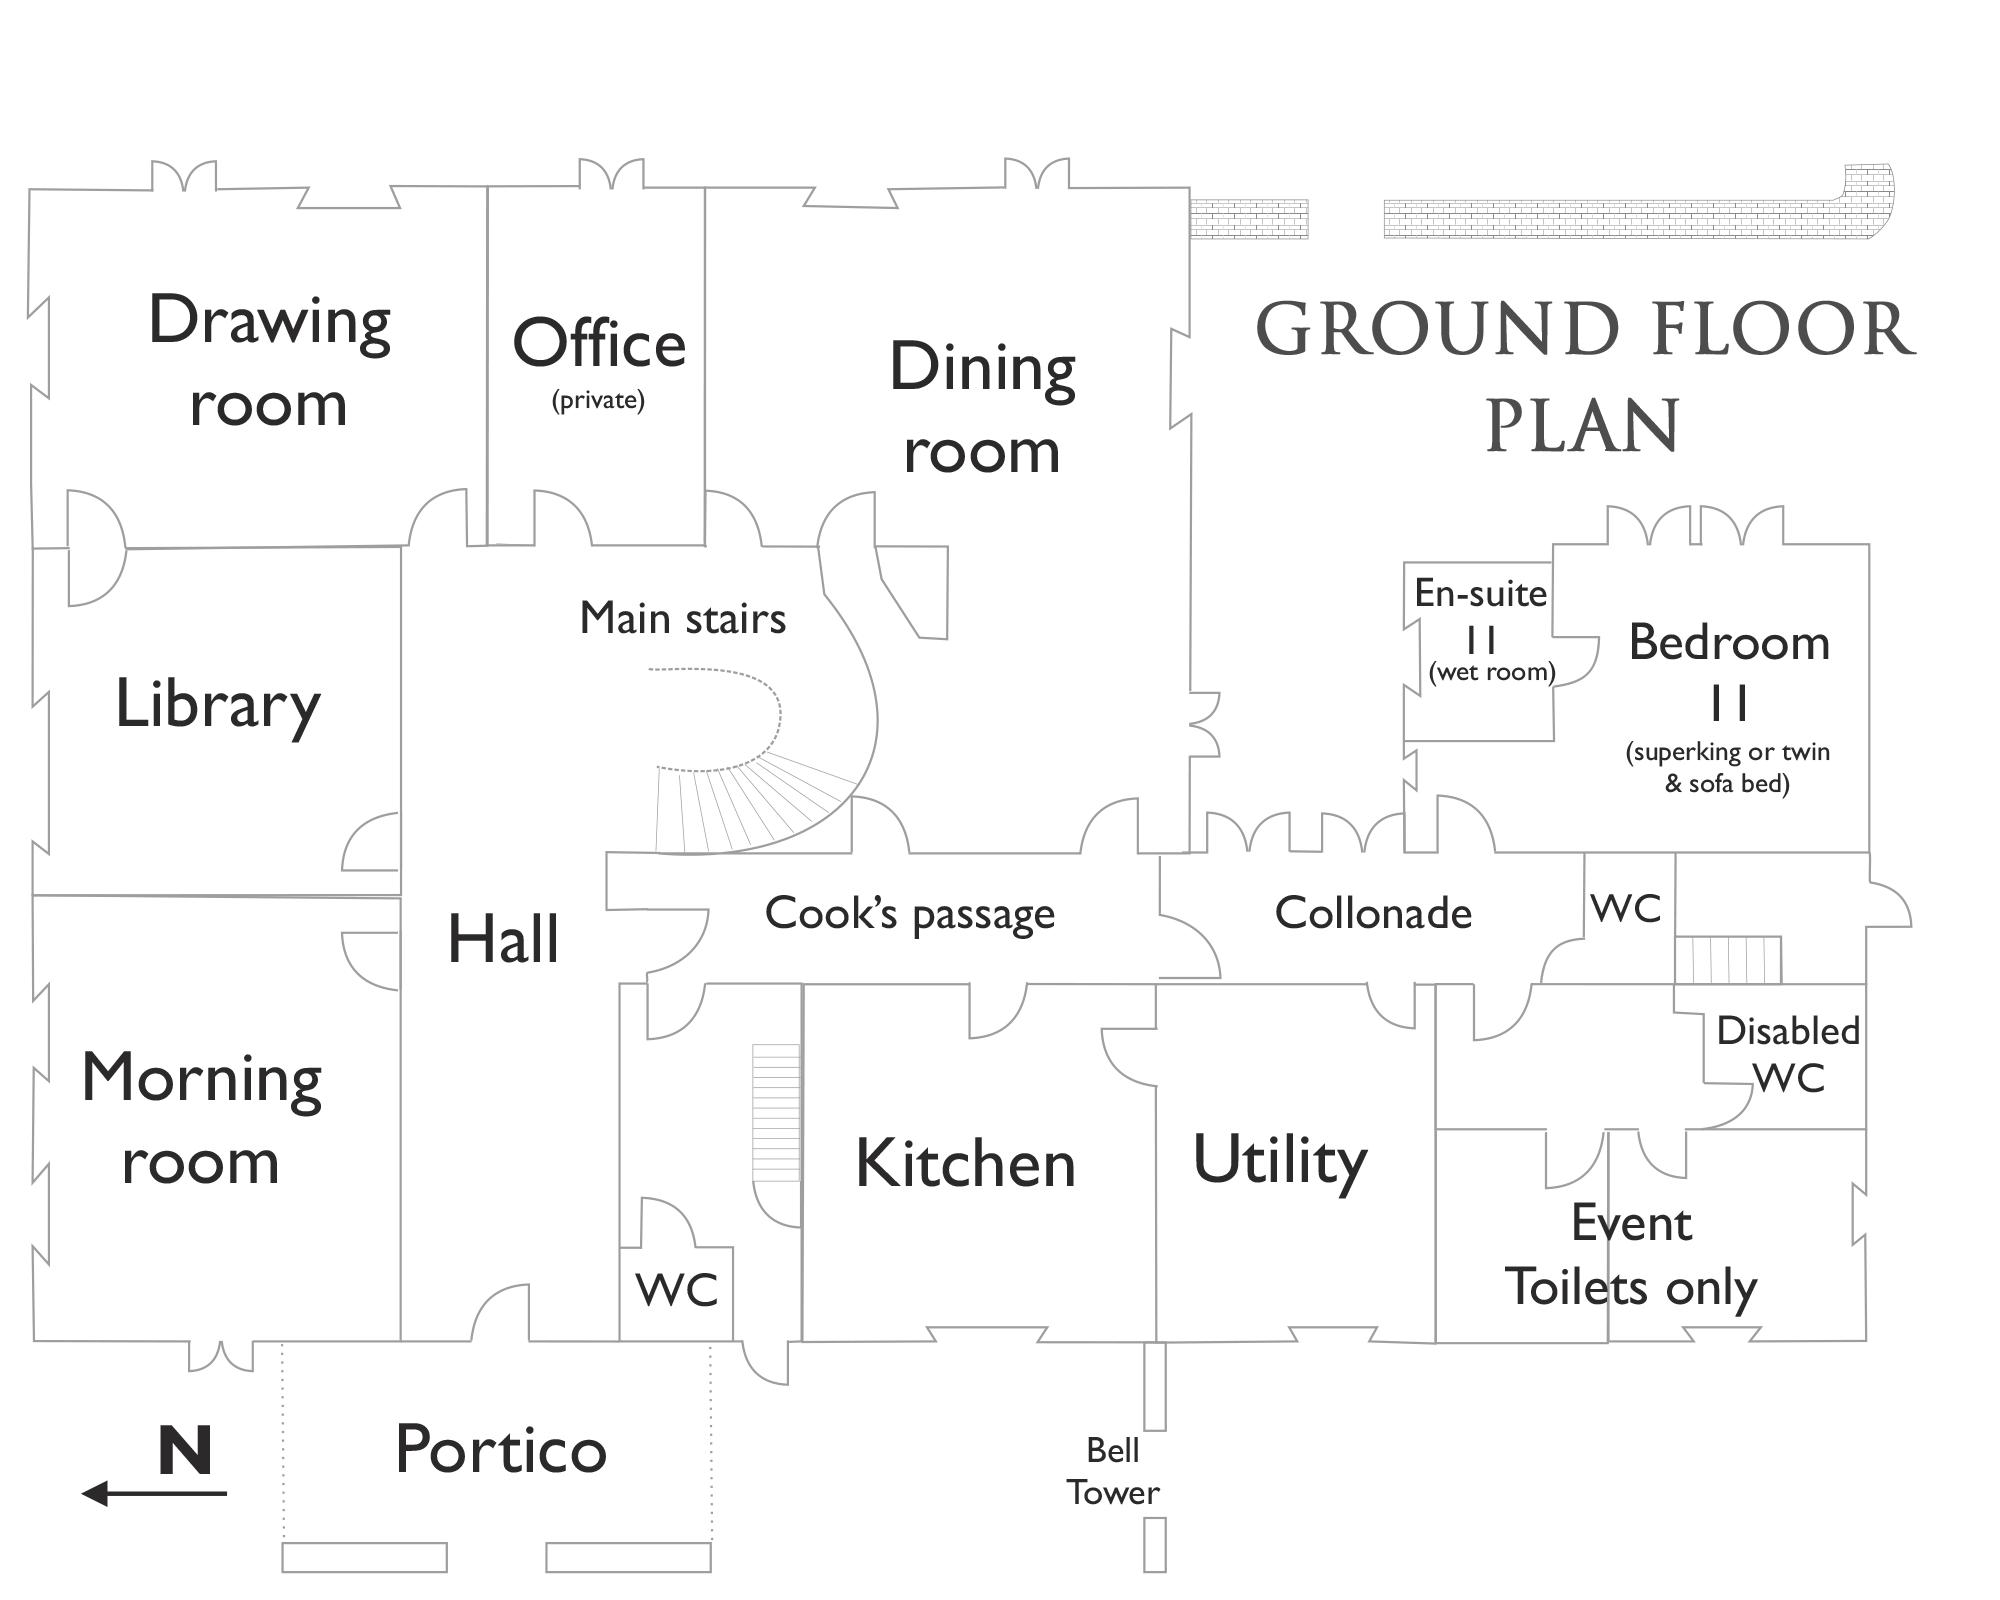 Hallsannery House Ground Floor Plan